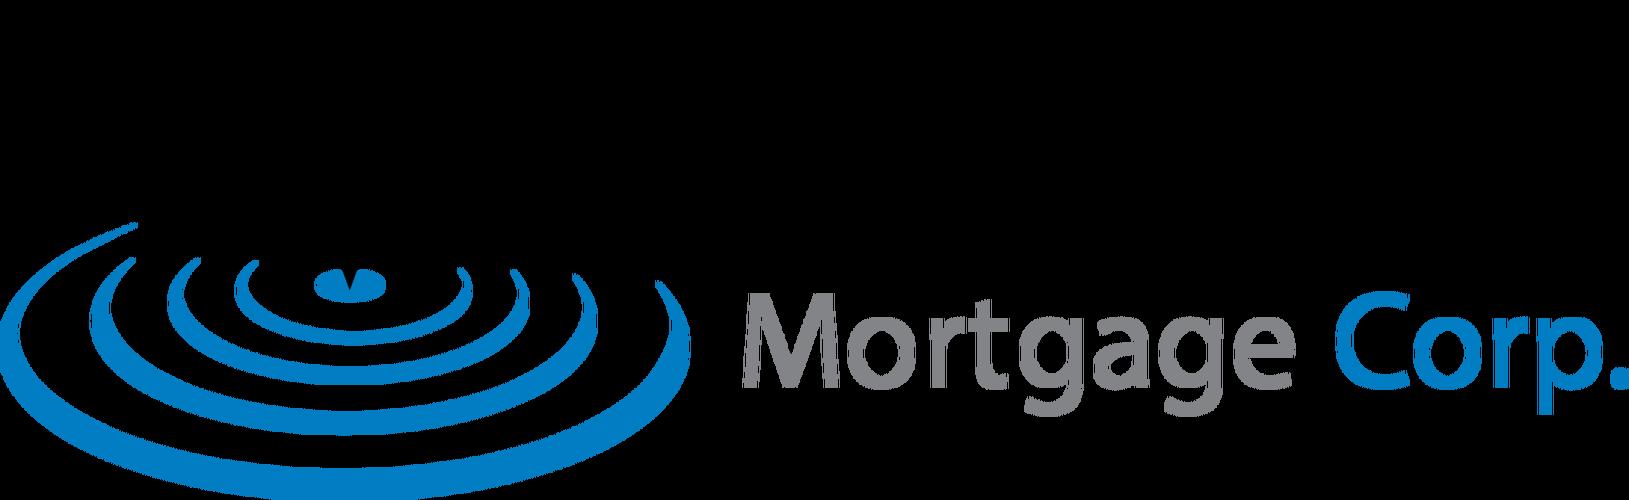 Impac Mortgage Corp.